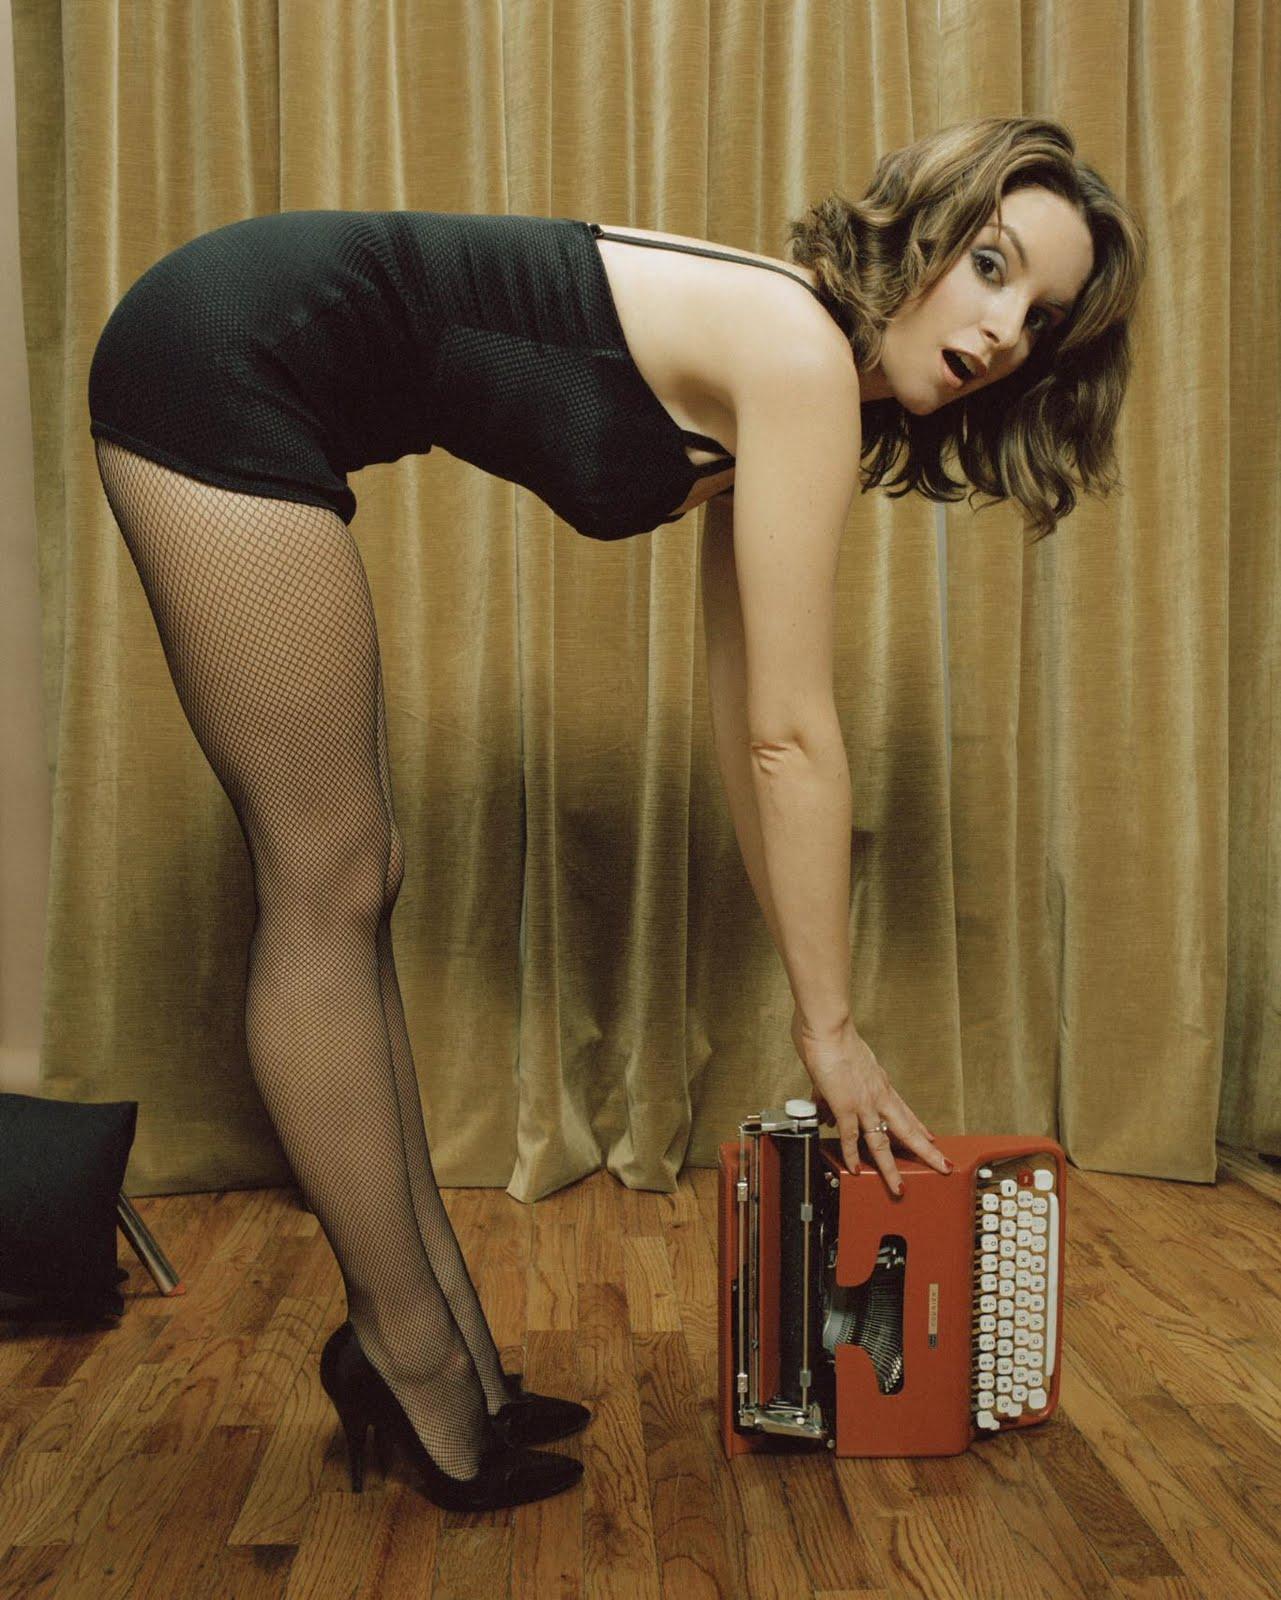 Laura bottrell nude Nude Photos